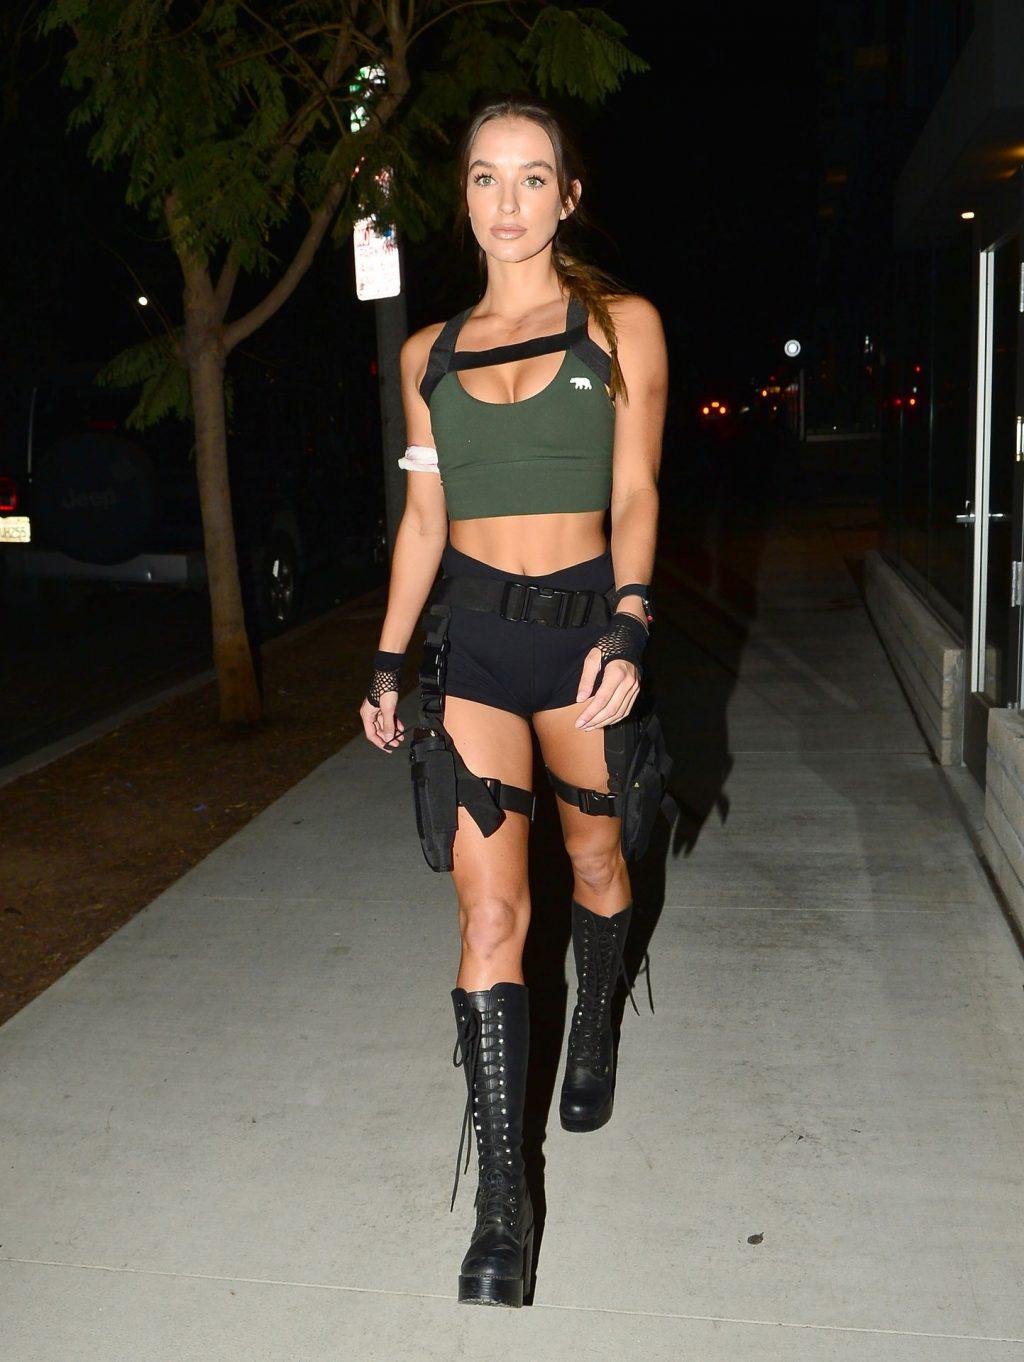 Francesca Farago & Casey Boonstra Arrive at a Private Halloween Party in LA (25 Photos)